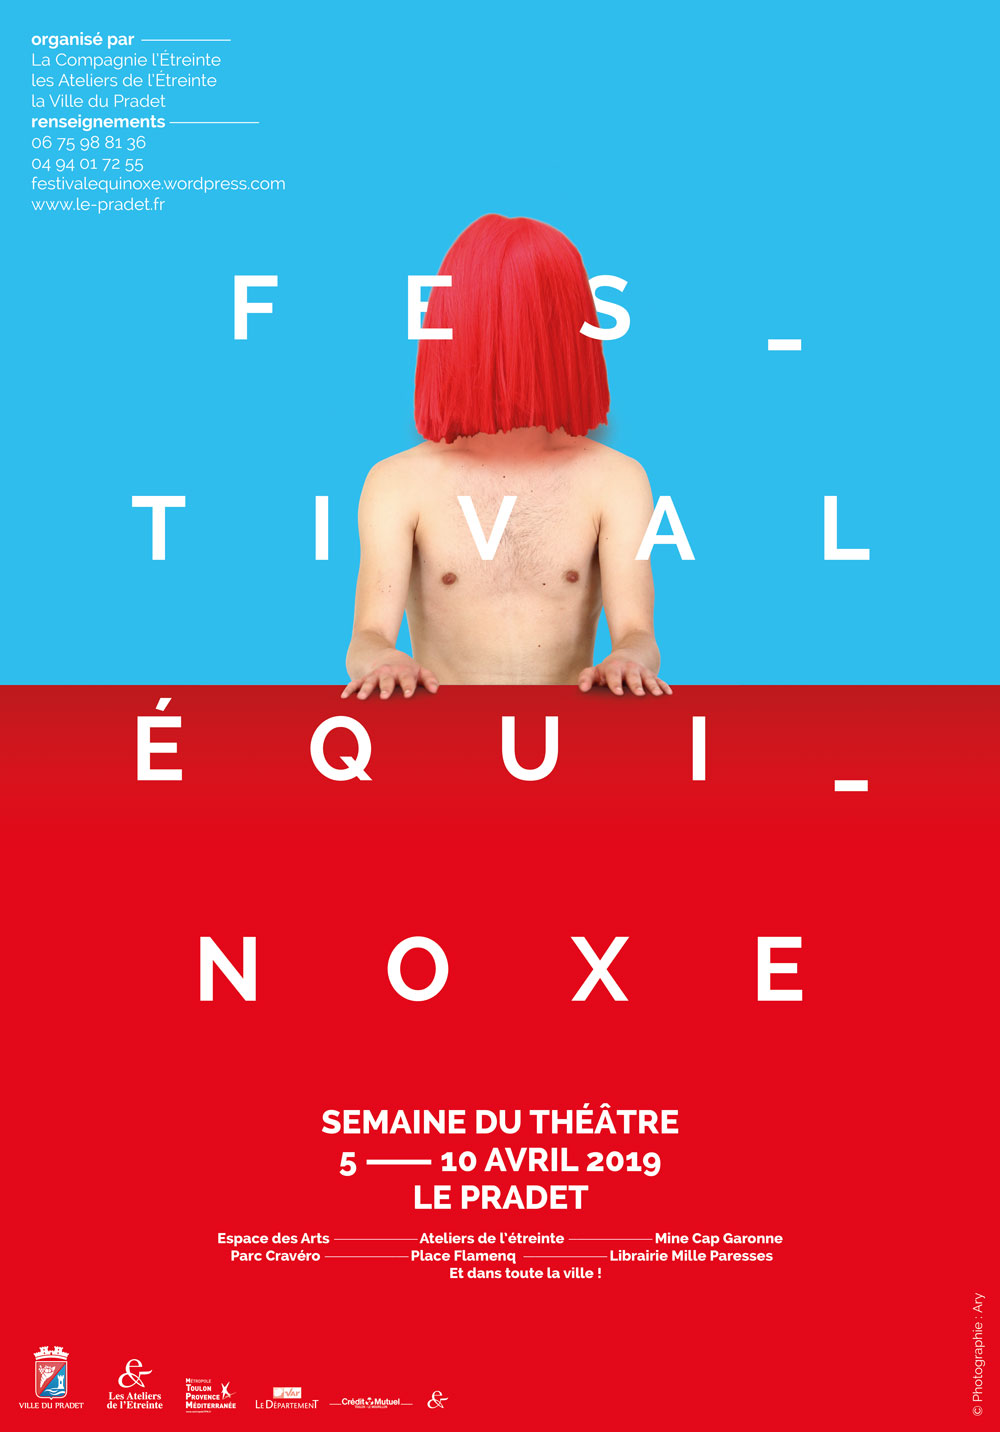 Festival Equinoxe au Pradet du 05 au 10 avril